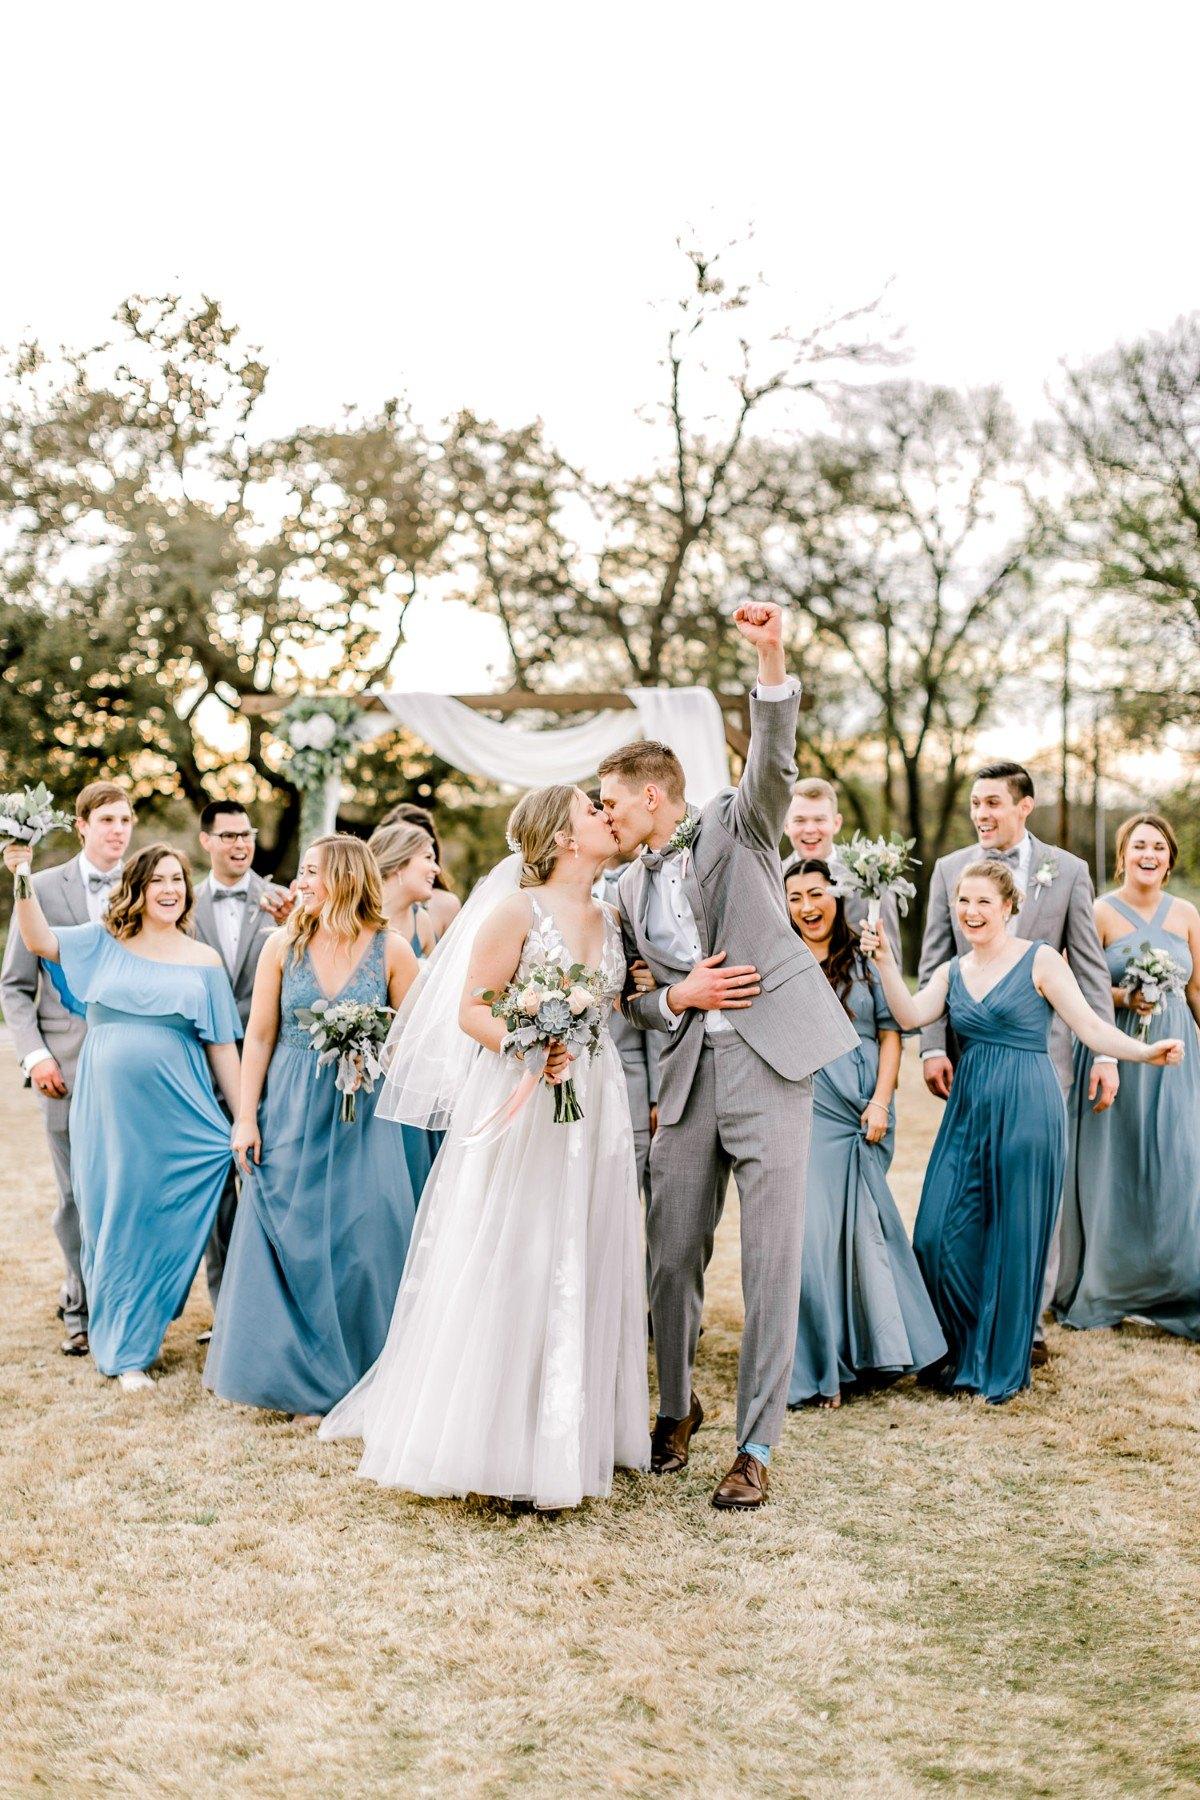 ennis-texas-wedding-photographer-kaitlyn-bullard-89.jpg